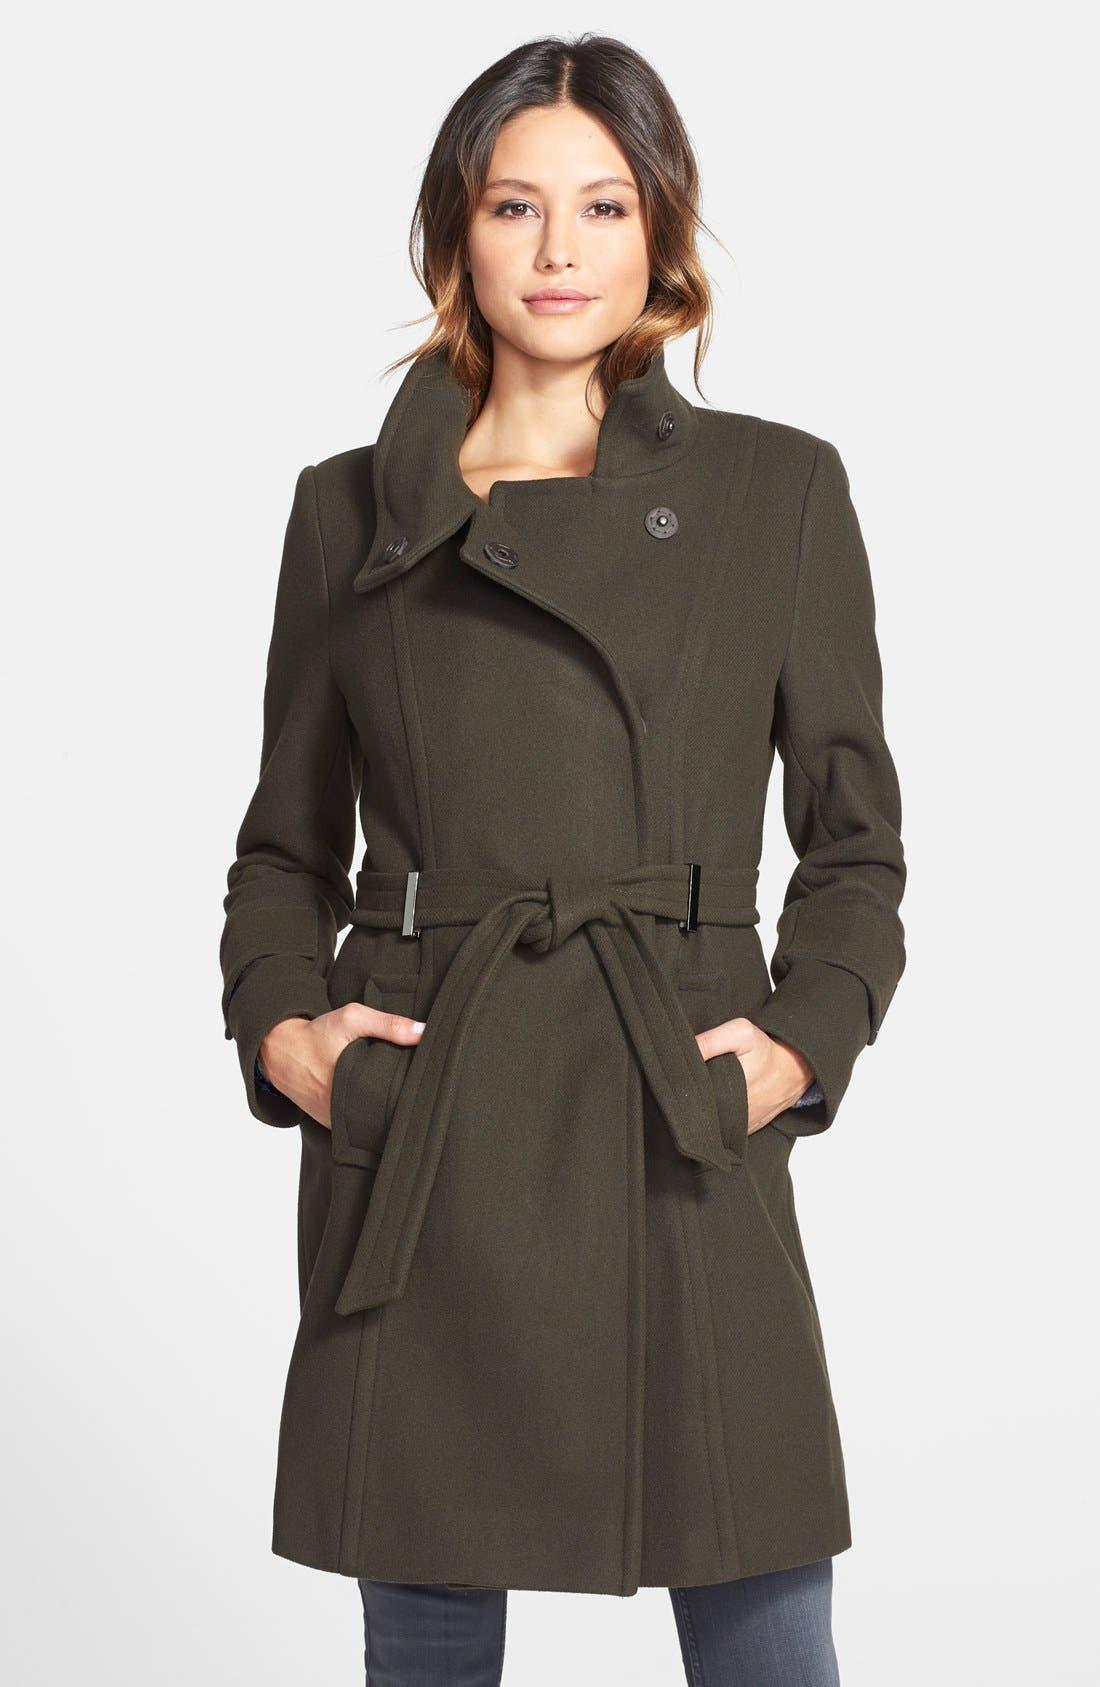 Alternate Image 1 Selected - Elie Tahari 'India' Stand Collar Belted Wool Blend Coat